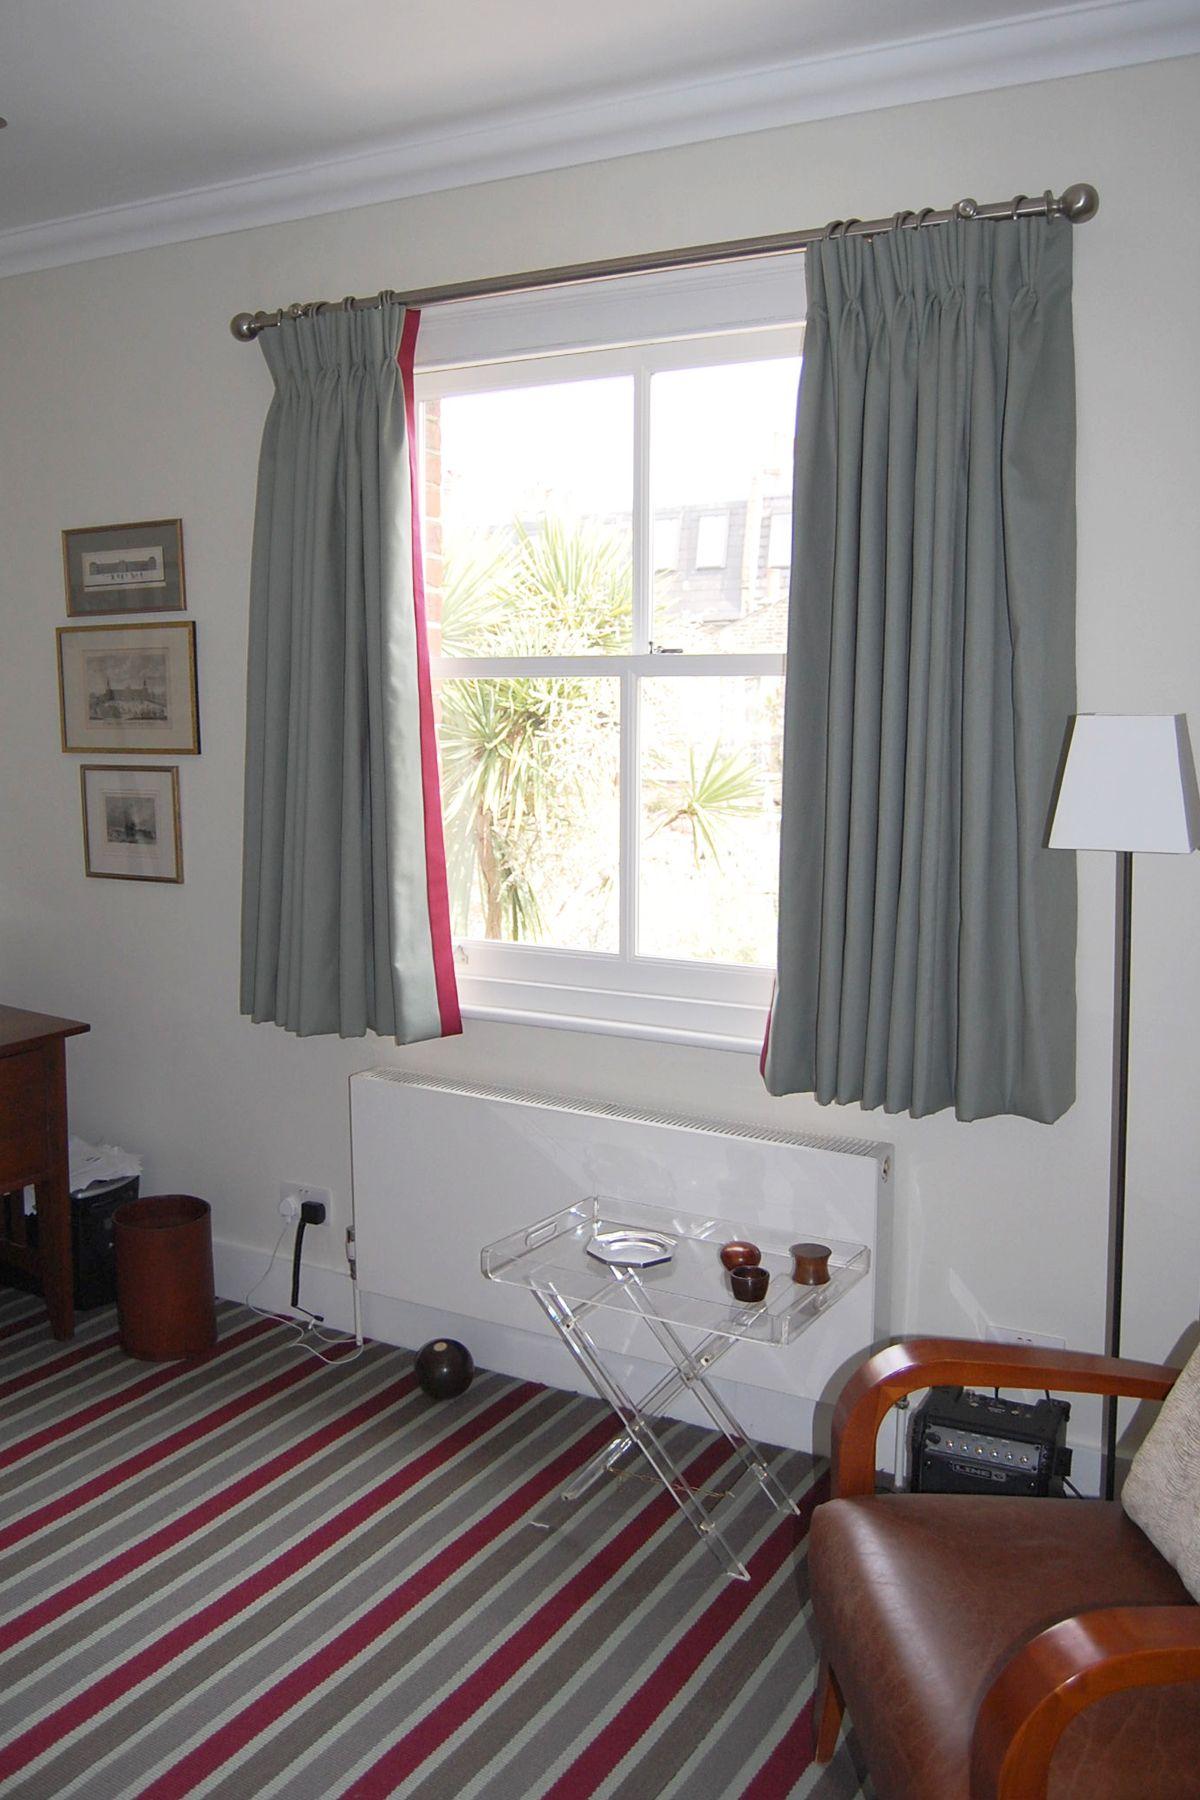 404 not found short window curtains